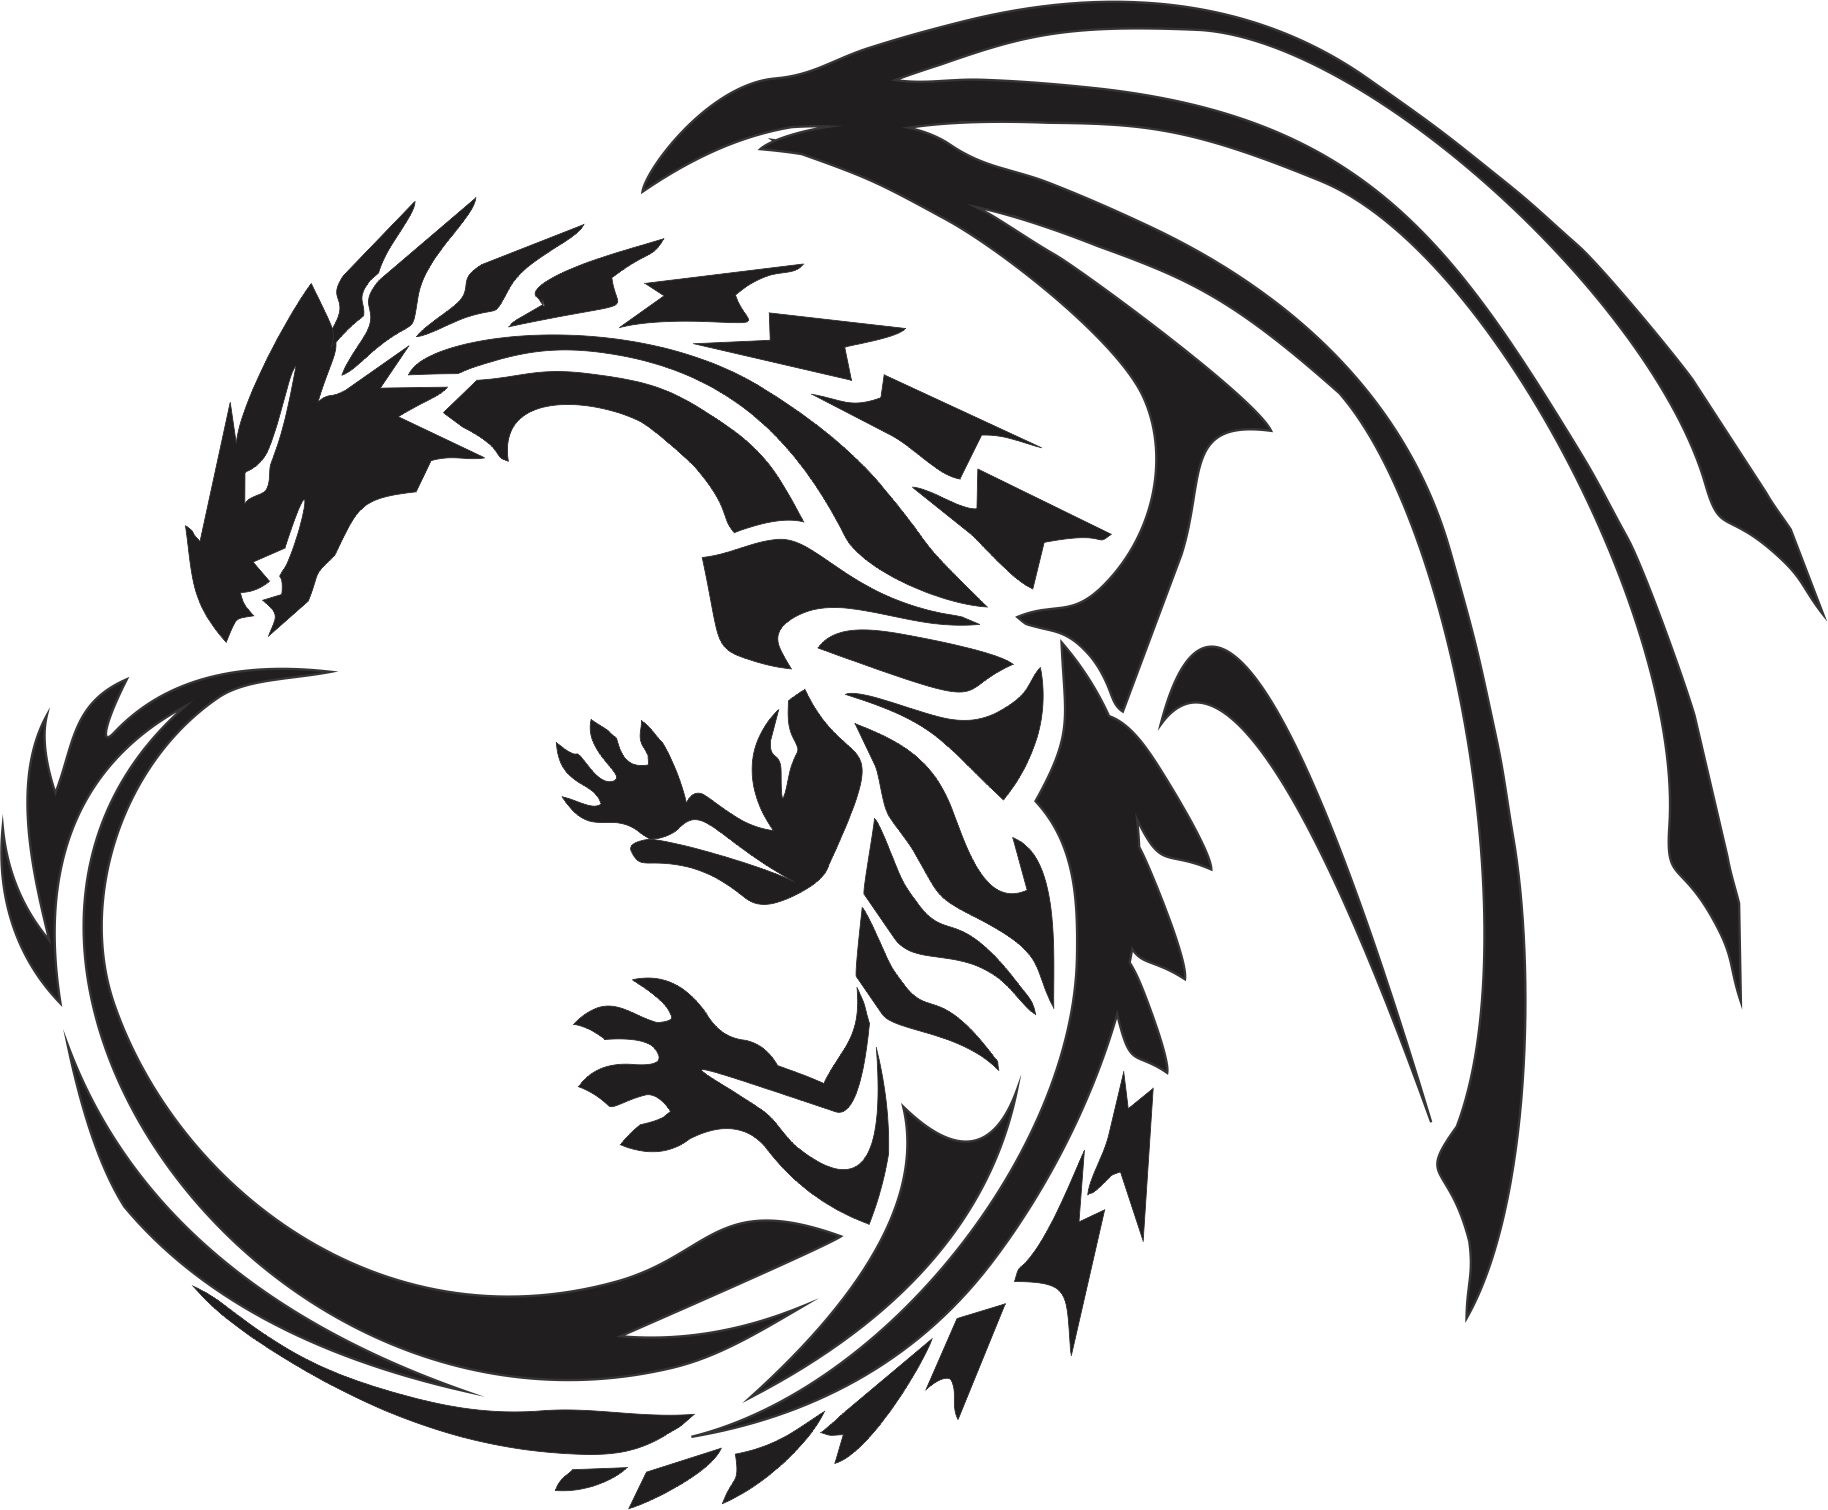 Welsh dragon tattoo designs - 23 Dragon Tribals For Use On Designs Tattoos Designs Lytum